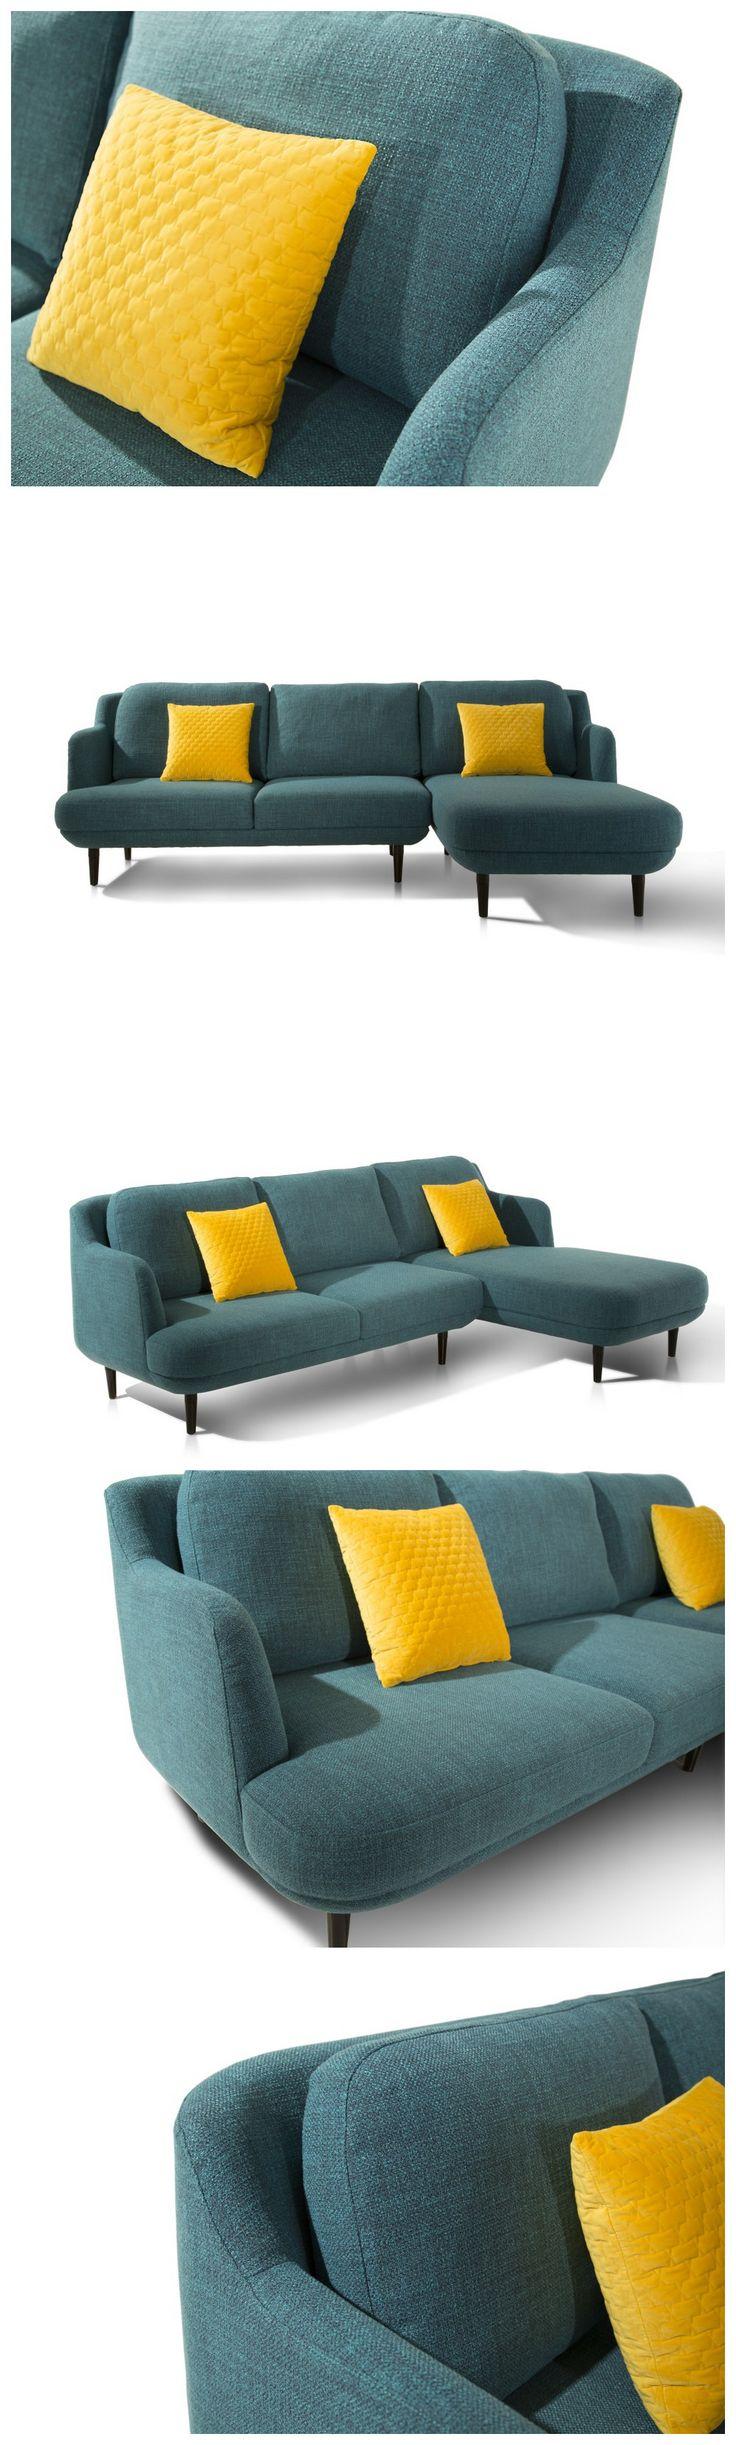 fancy living room furniture wooden sofa set designs  #sofaset #sofa #cocheen #modernsofa #cocheendesign #livingroomsofa #furniture #newdesign #sectionalsofa #homefurniture #couch #furniturefactory  contact:jennifer@cocheen.com  online store link: cocheenfurniture.en.alibaba.com